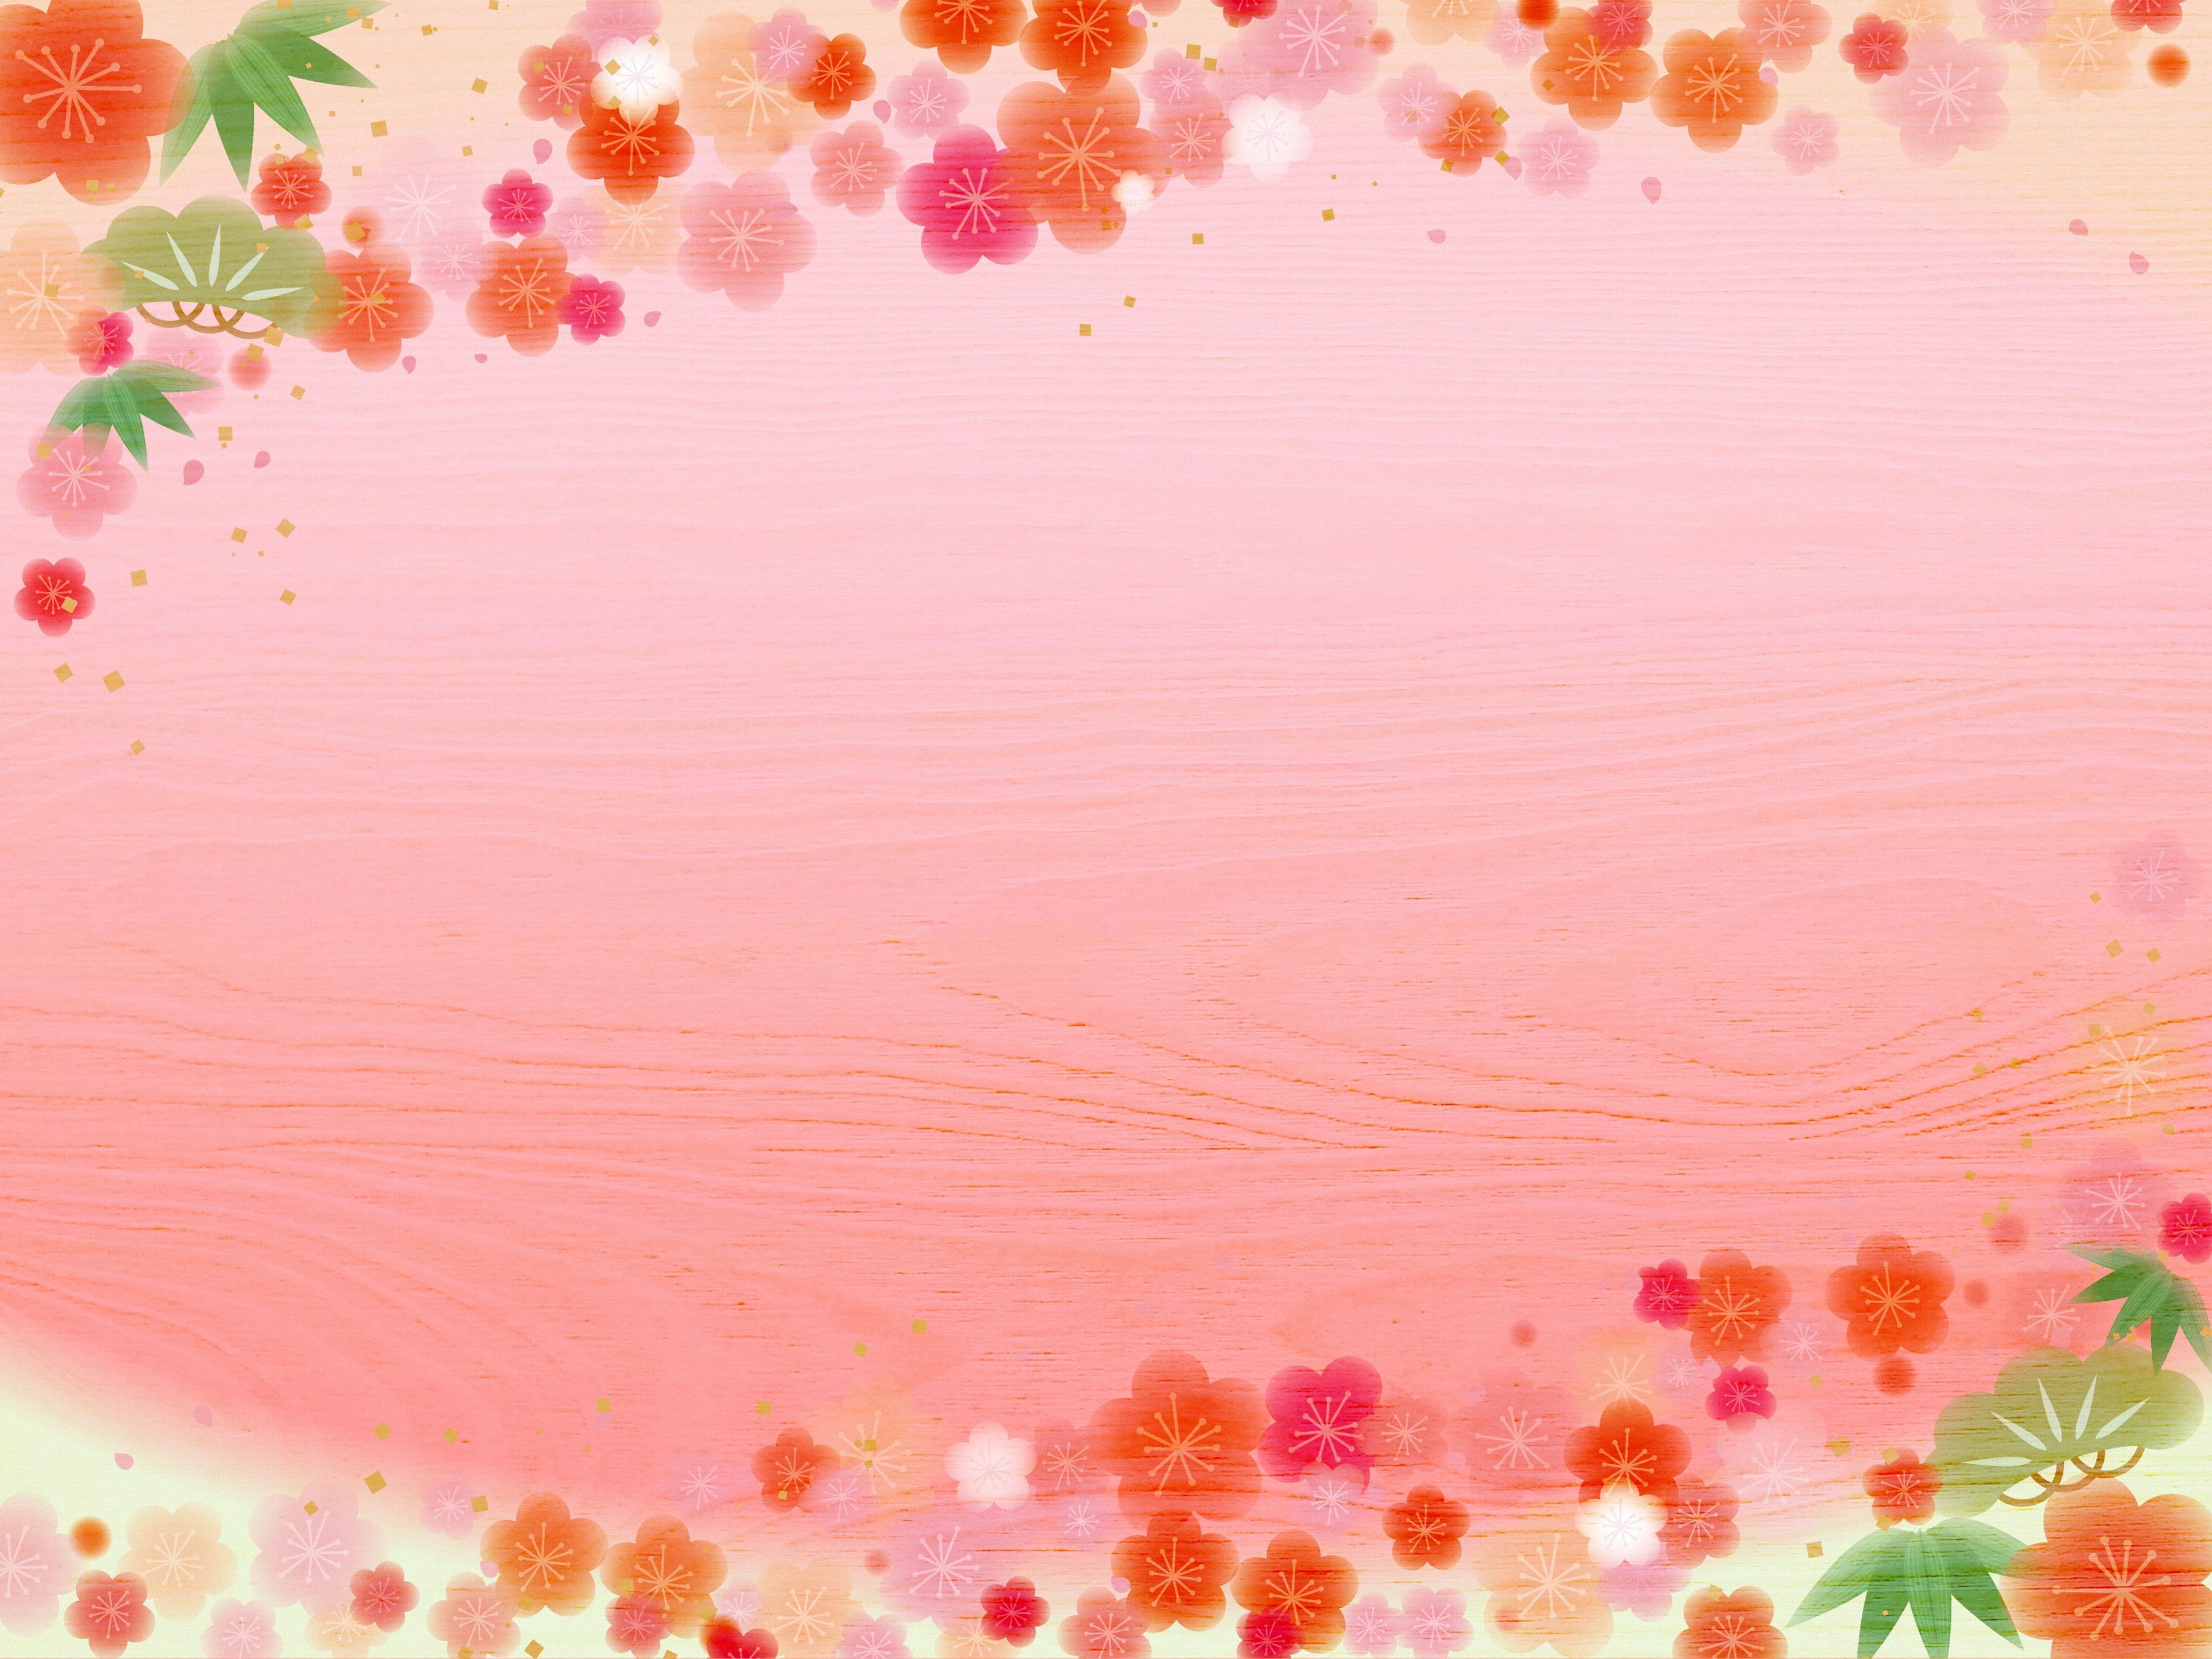 Artistic Flower 3600x2700